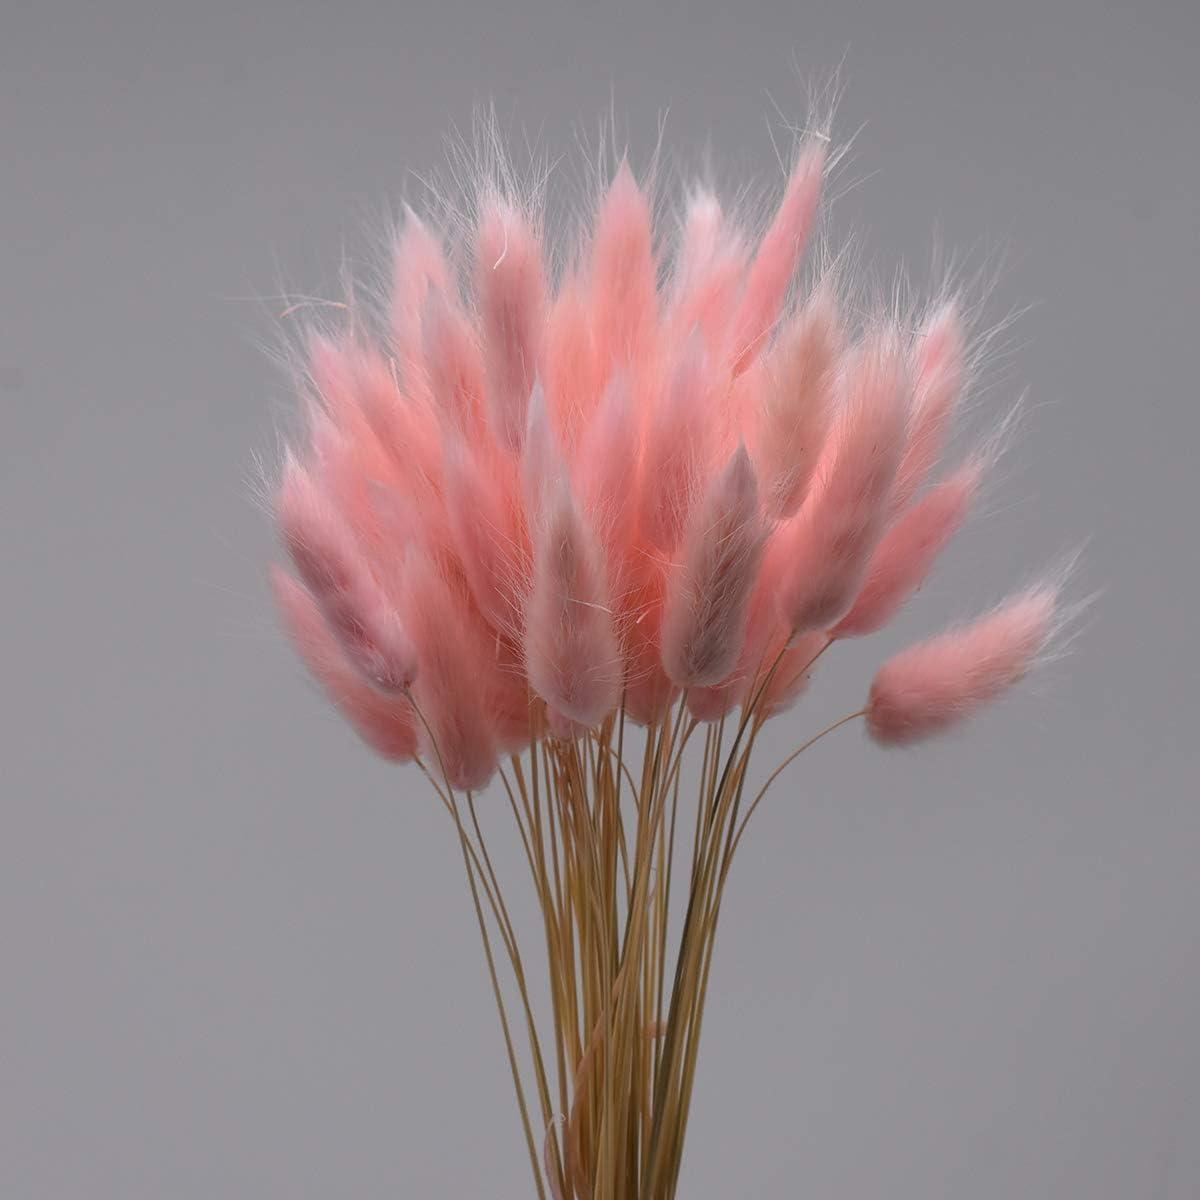 100Pcs Lagurus Ovatus,Naturally Dry Pampas Grass,Rabbit Tail Dried Flowers, Flower Arrangement Wedding Home Decoration(Pink)